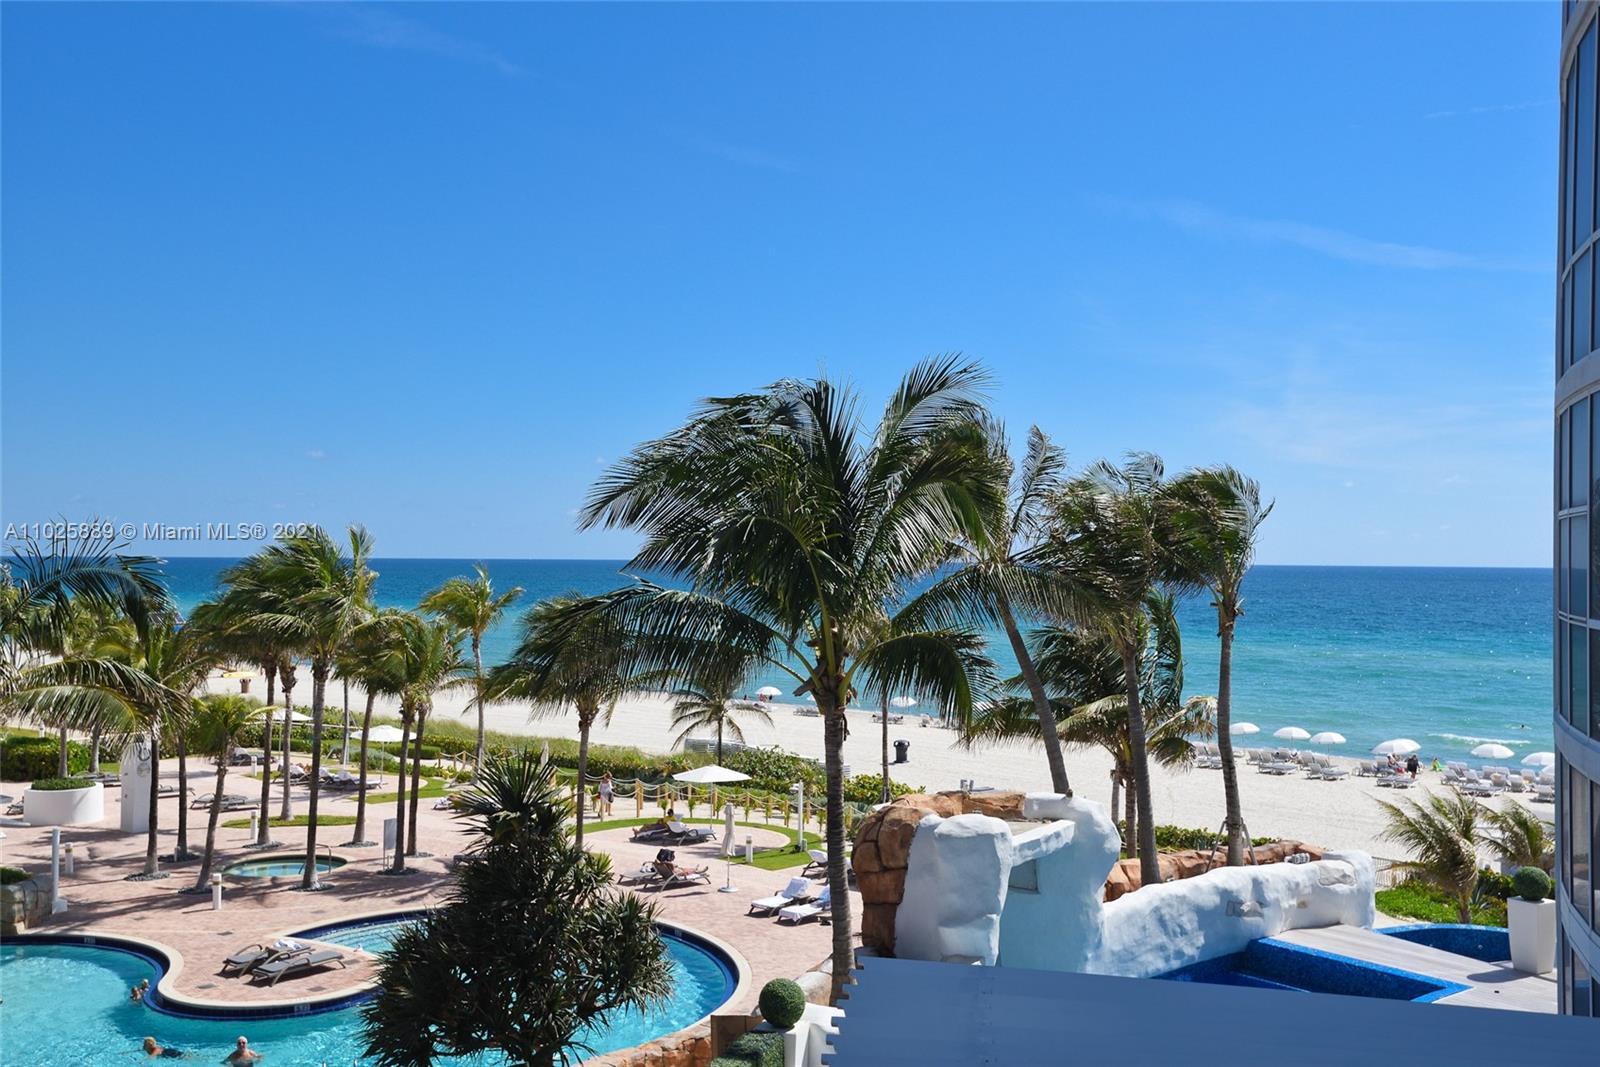 Trump Palace #508 - 18101 Collins Ave #508, Sunny Isles Beach, FL 33160